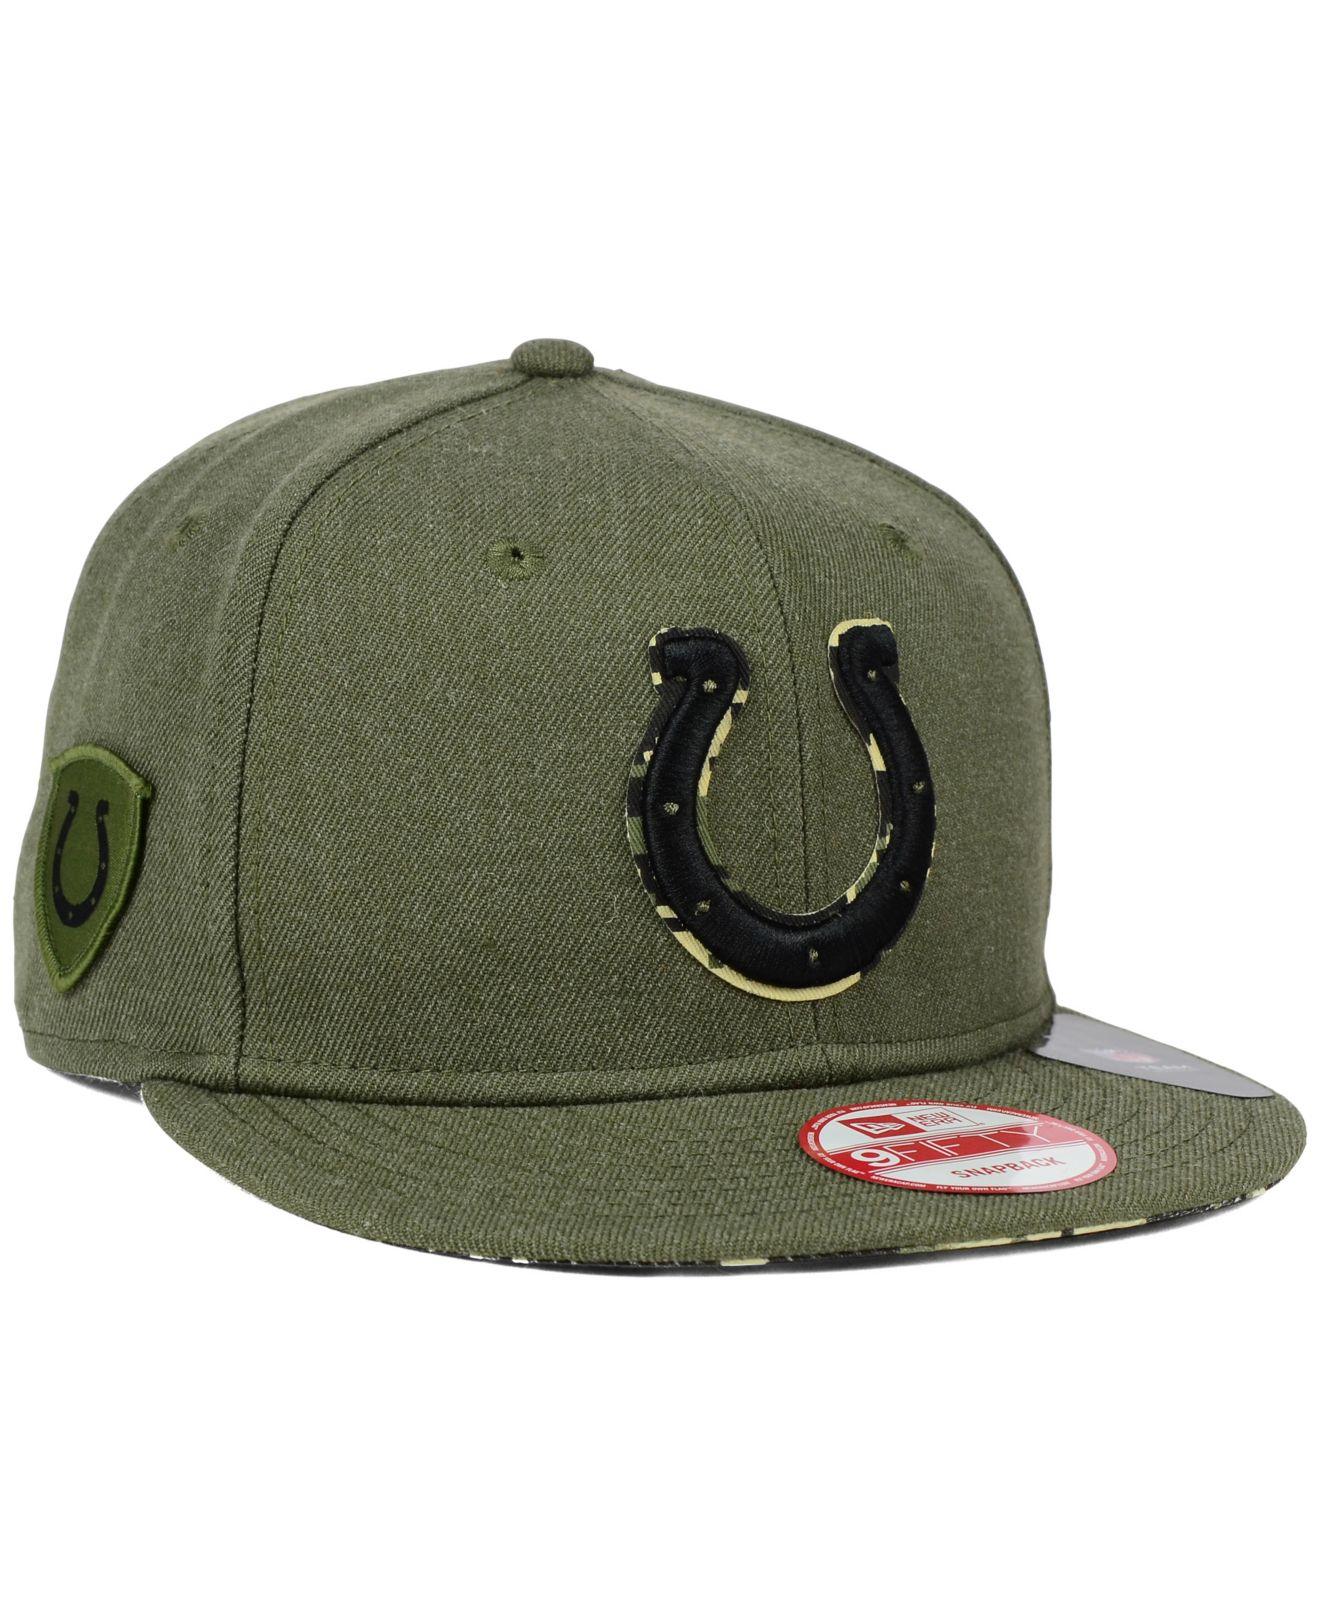 2f2f64d9310a9 Lyst - KTZ Indianapolis Colts Camo 9fifty Snapback Cap in Green for Men